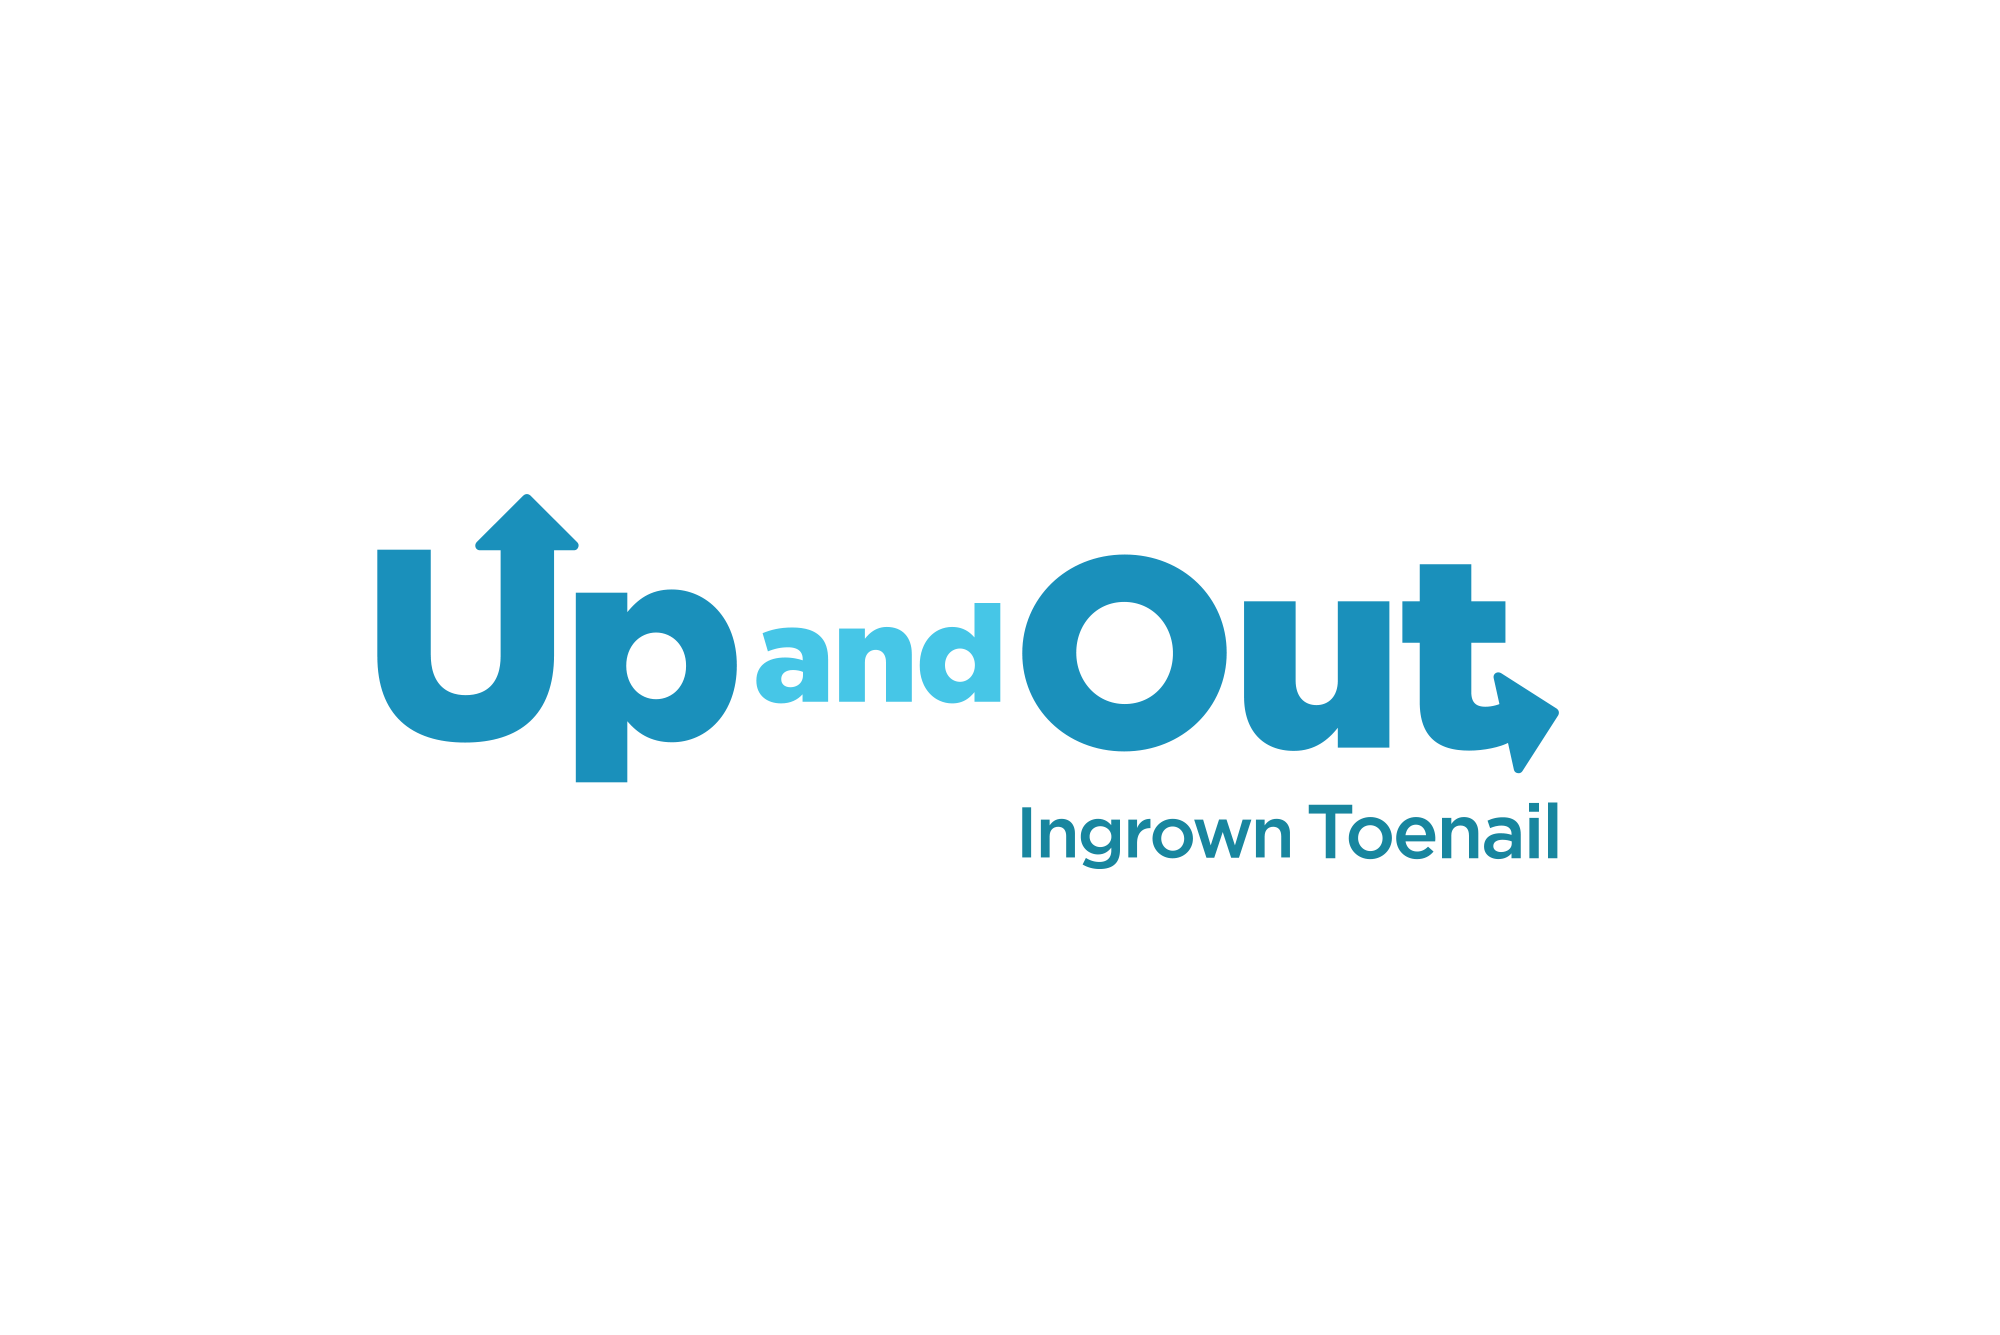 http://dubaipodiatry.com/wp-content/uploads/2015/12/DPC_logos_upandout.png